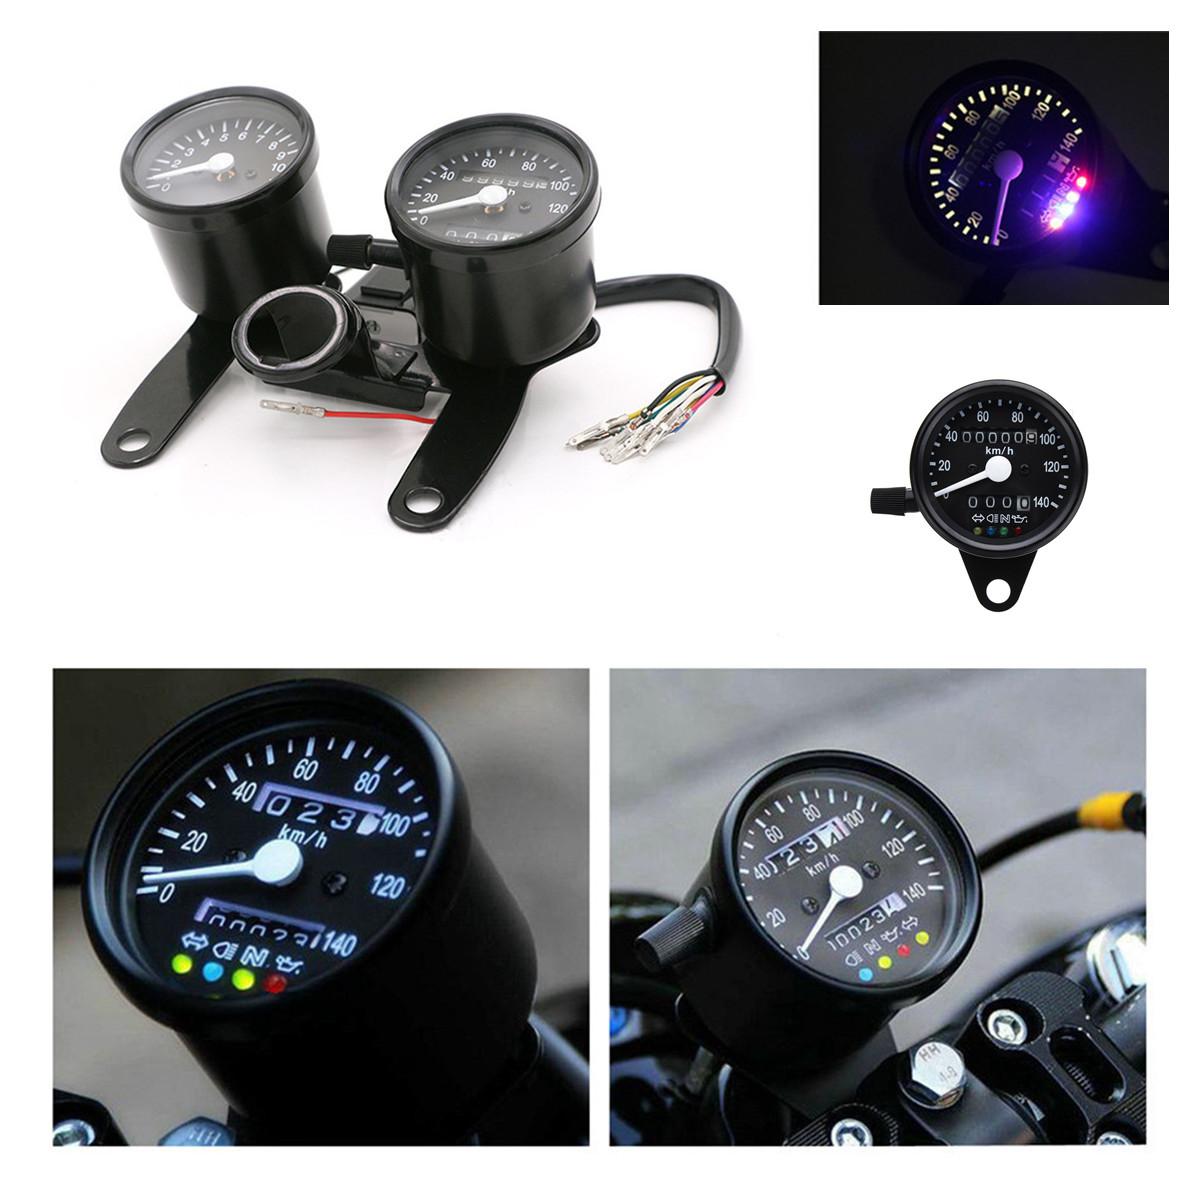 Round Motorcycle Speedometer Tachometer Odometer For Bobber Chopper Cafe Racer